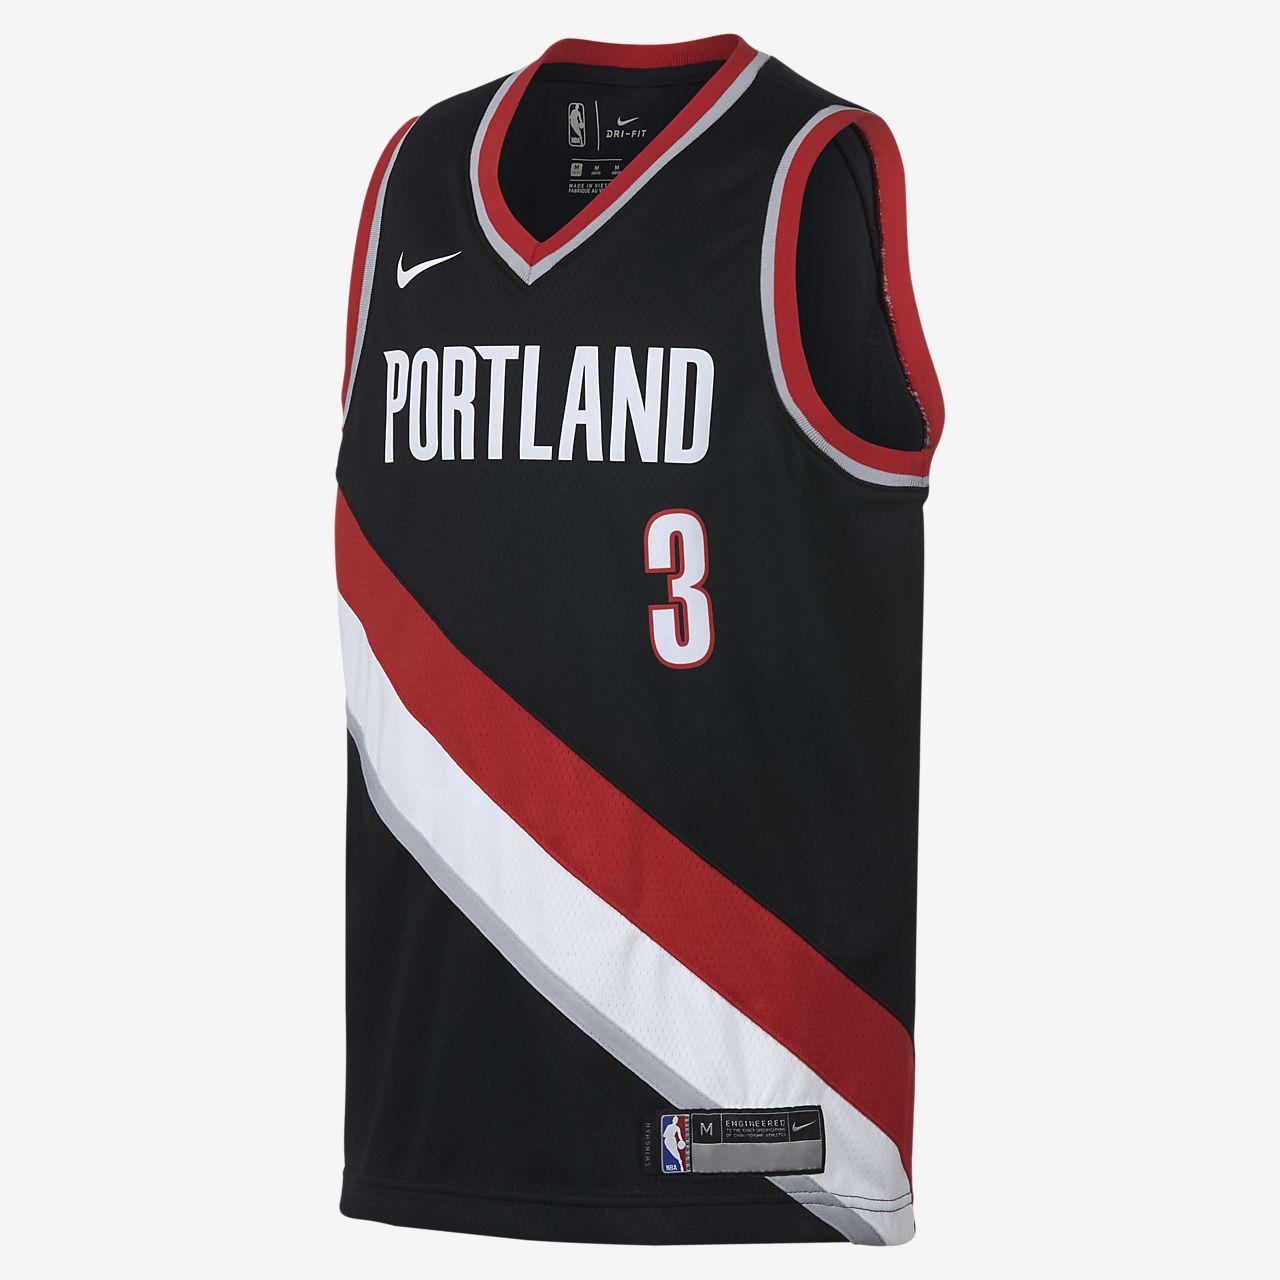 Portland Trail Blazers Media Guide: CJ McCollum Portland Trail Blazers Nike Icon Edition